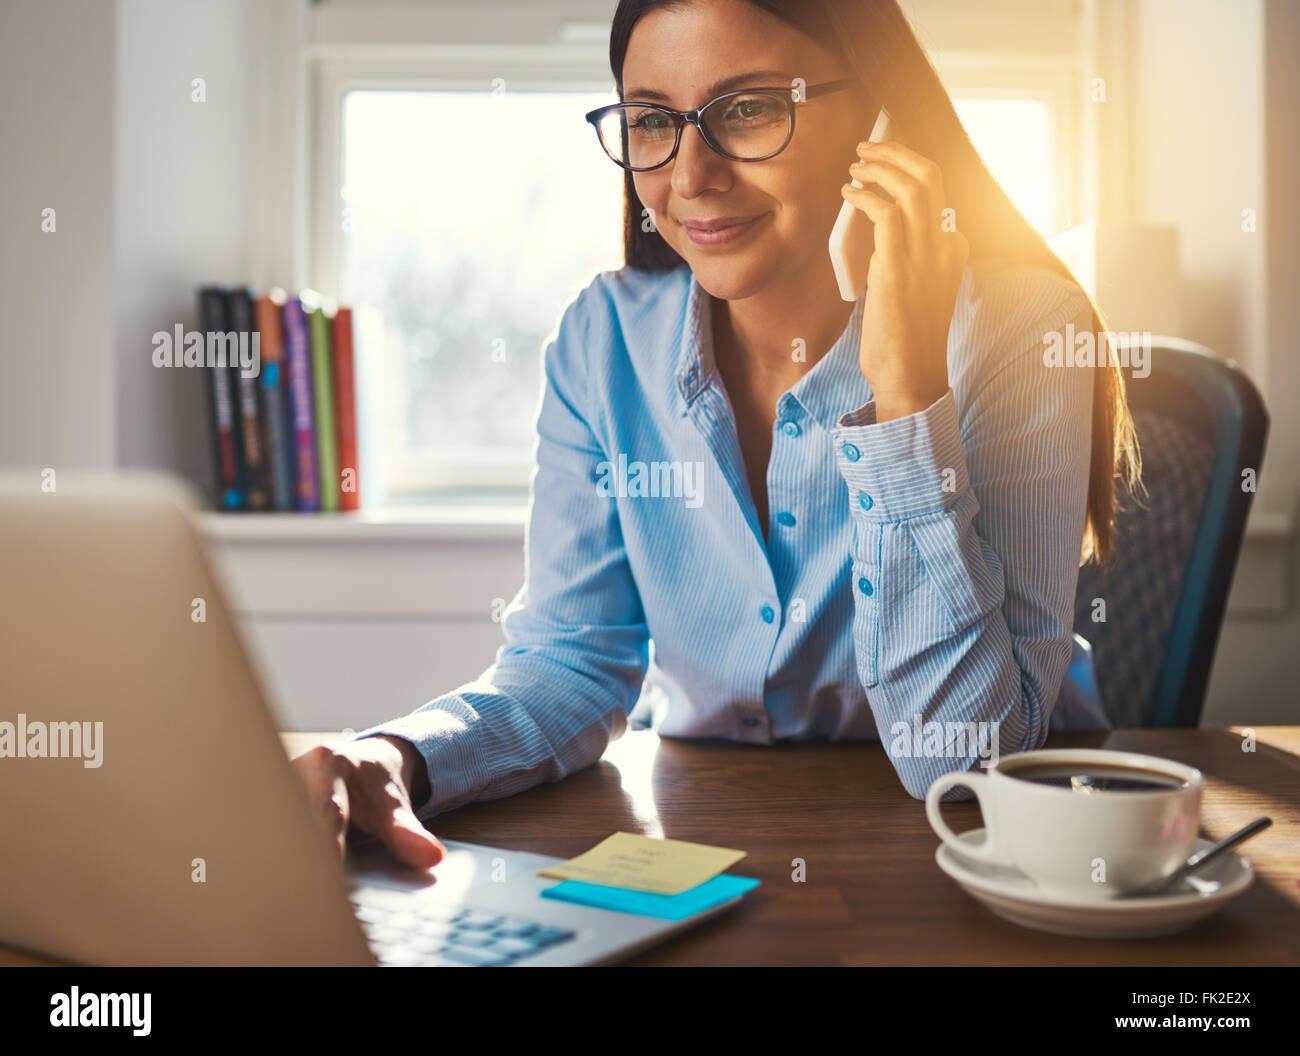 Female entrepreneur working at desk business woman concept - Stock Image